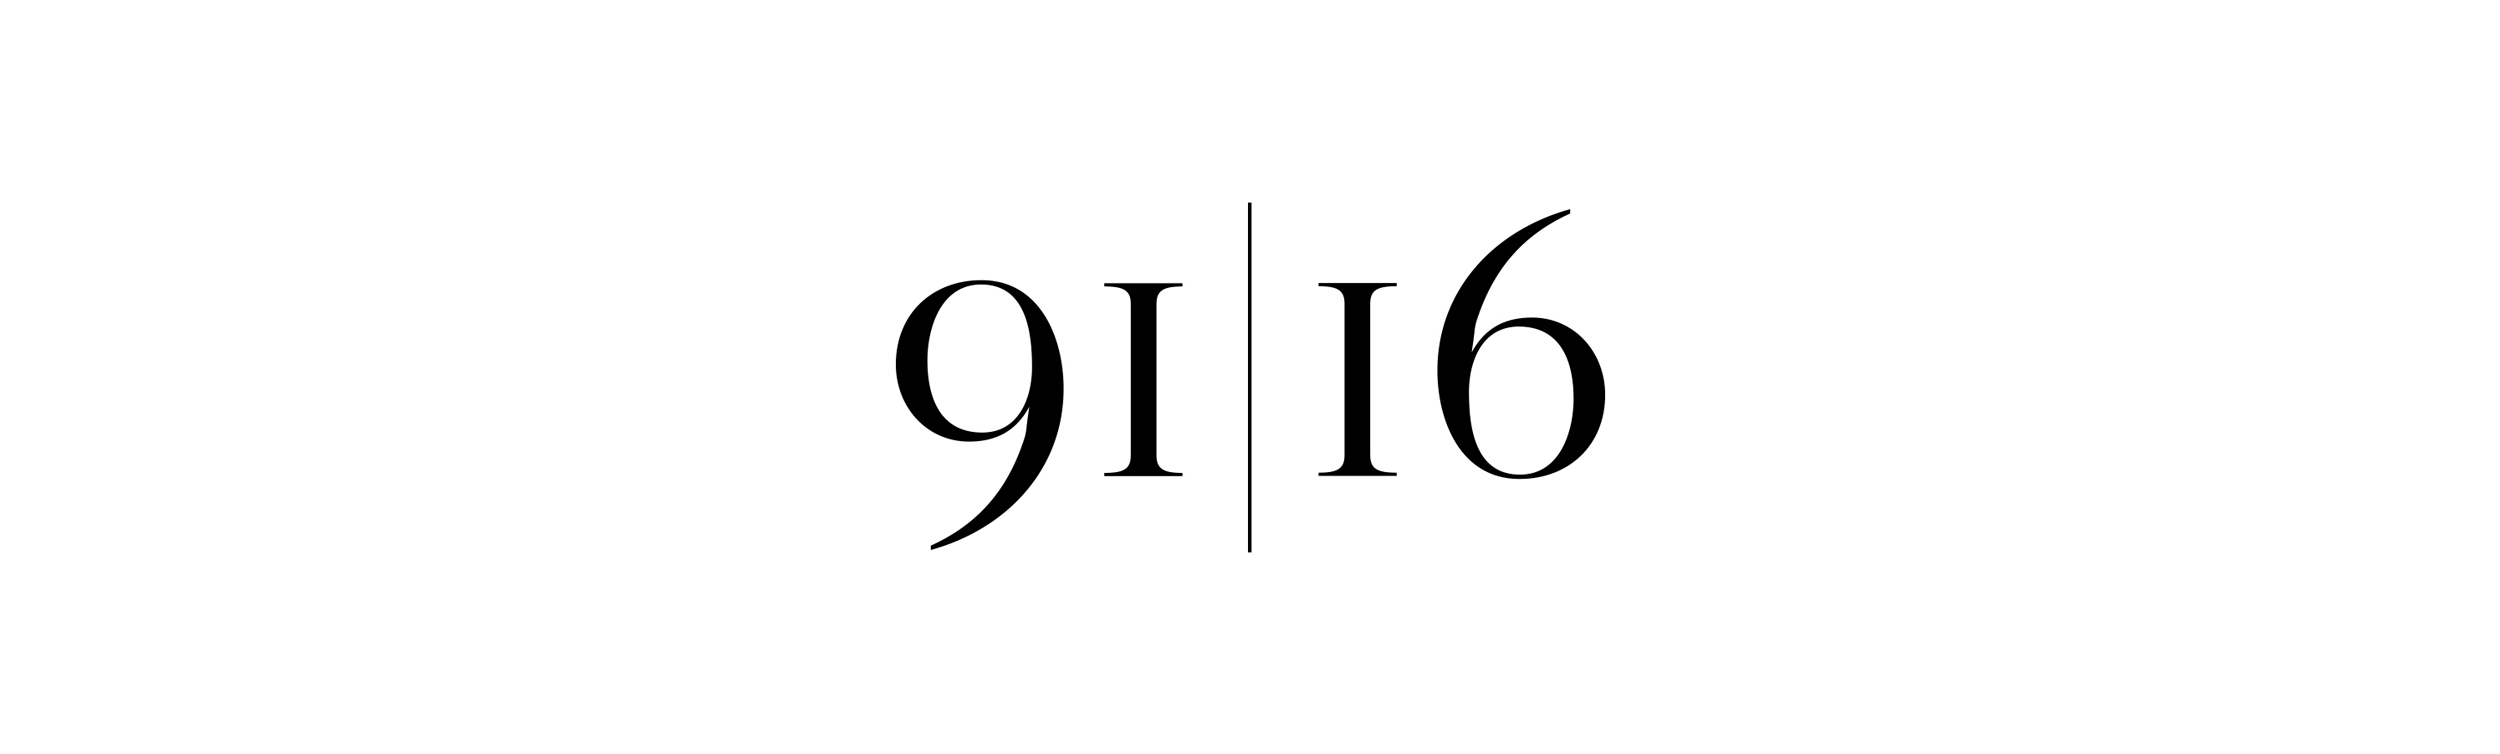 Charlotte_Willow_Retief_Laurence_King_25th_Anniversary_Logo_BW.jpg